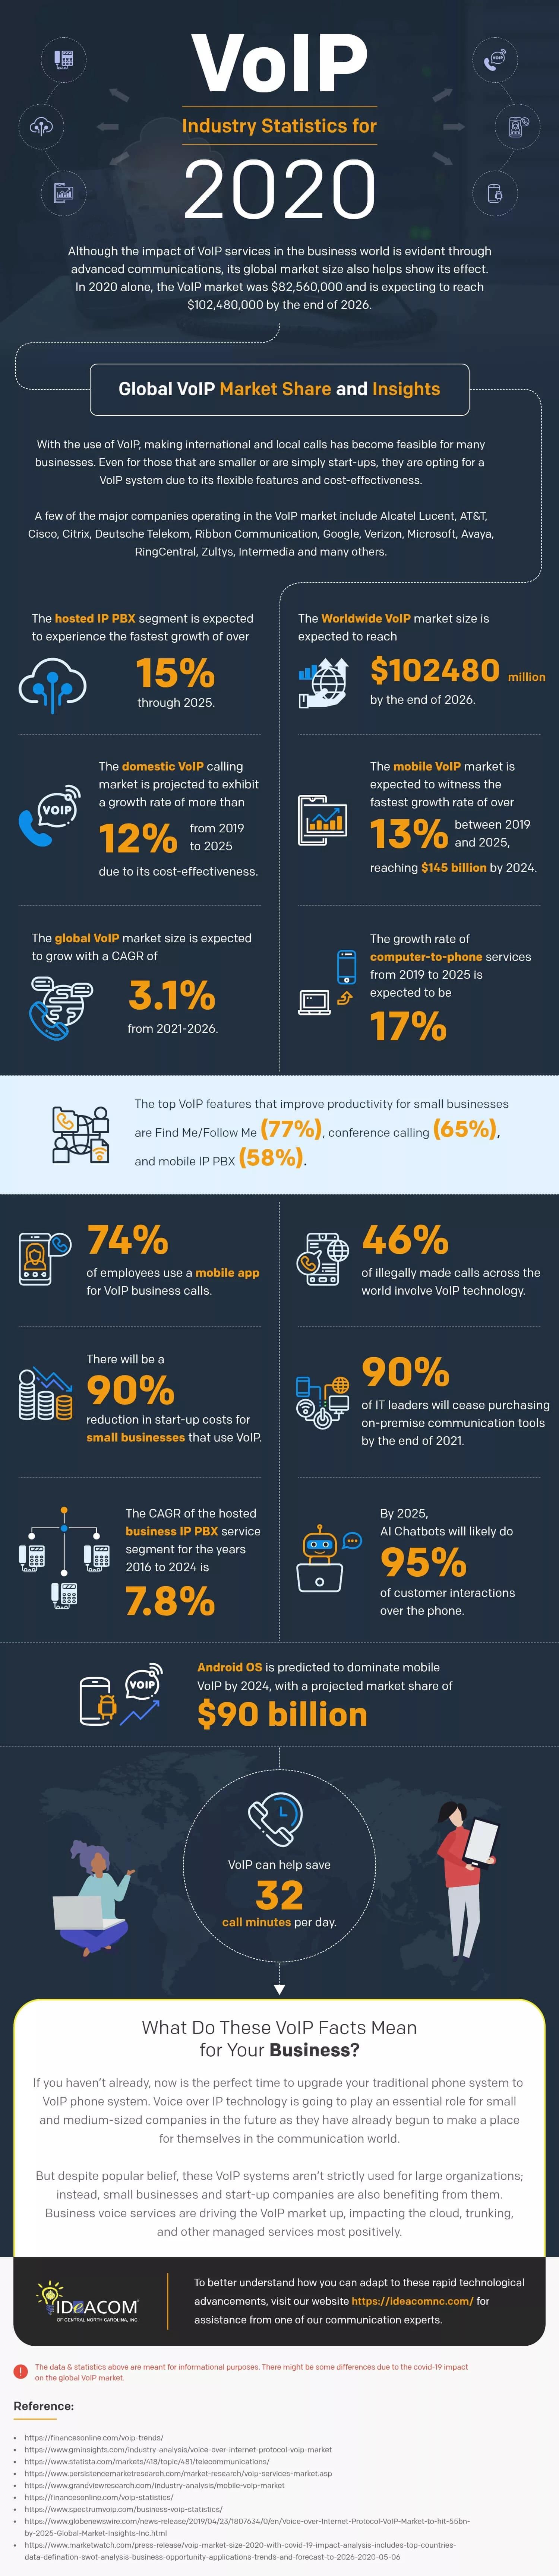 VoIP-Industry-Statistics-2020